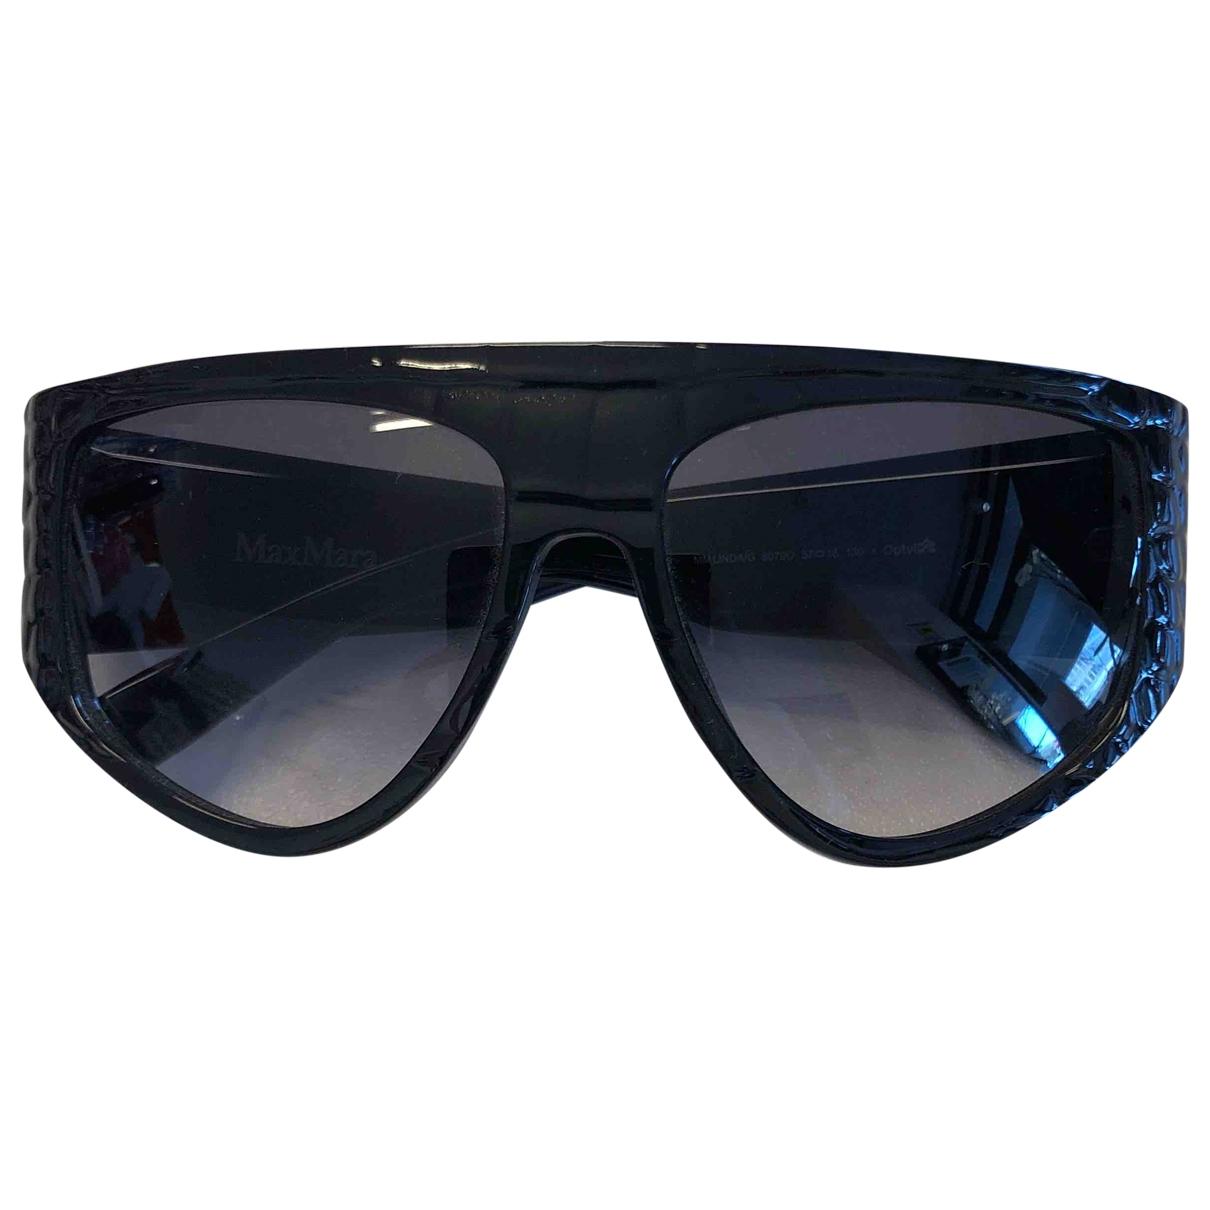 Gafas oversize Max Mara